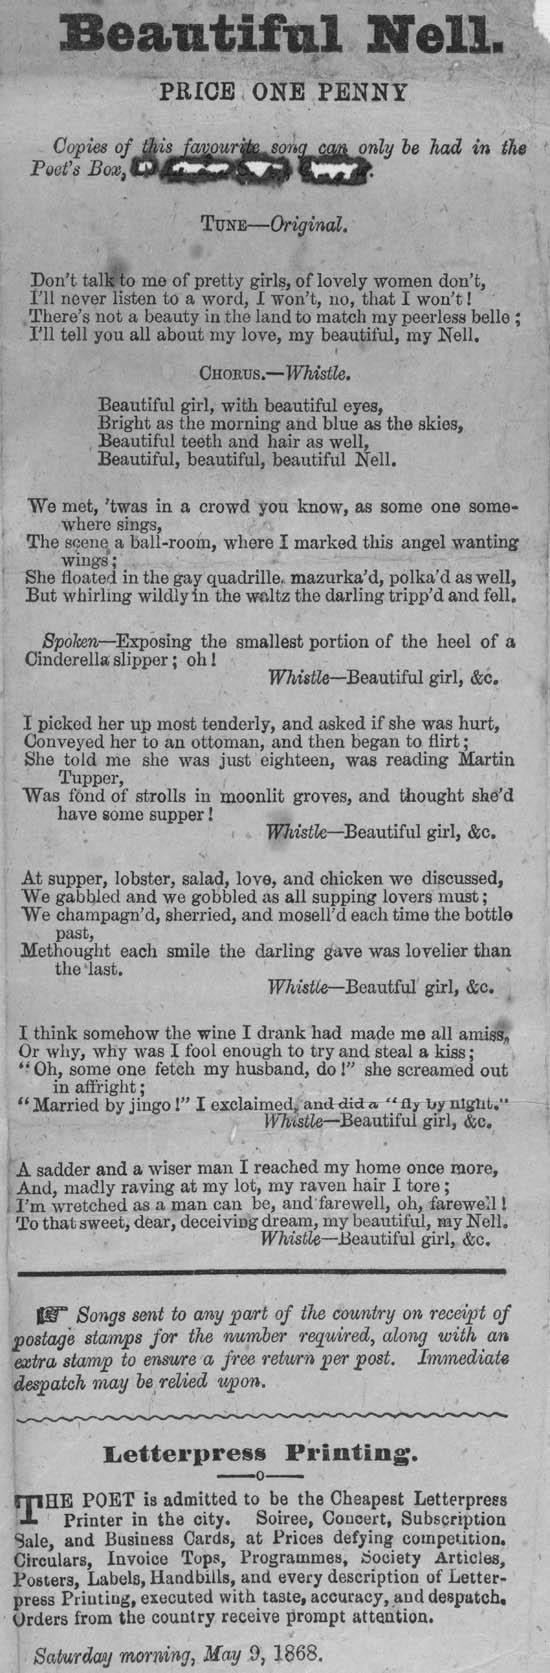 description of a beautiful girl